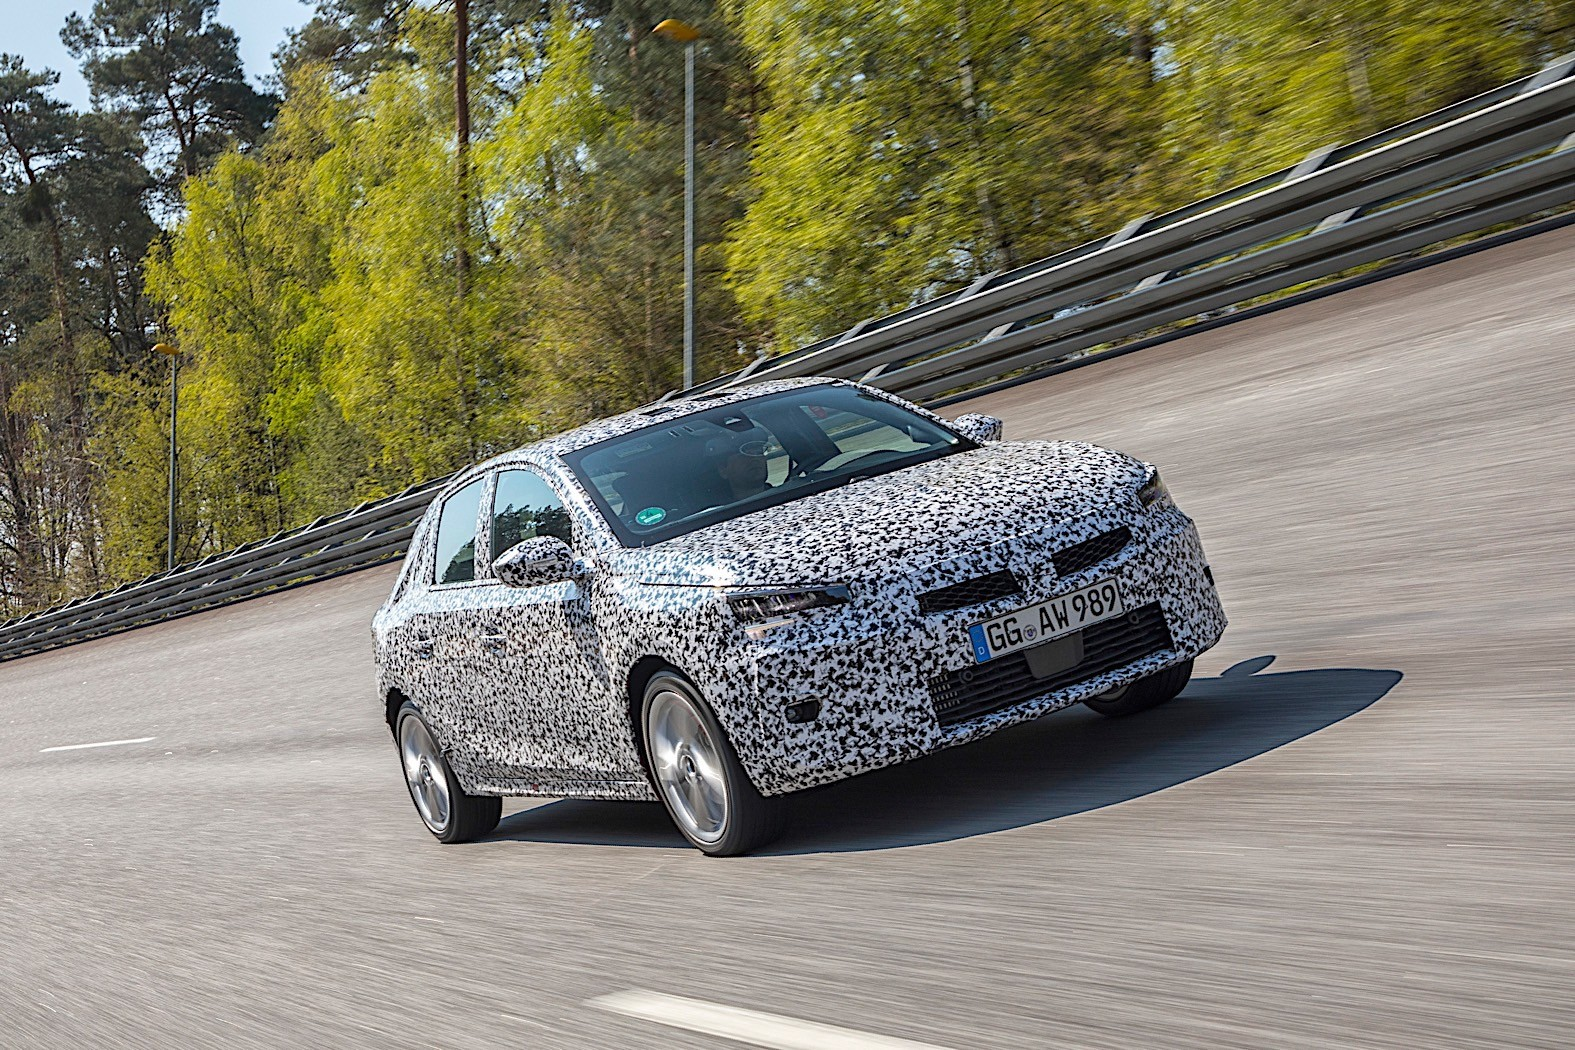 Nova Opel Corsa – prve zvanične fotografije (GALERIJA)